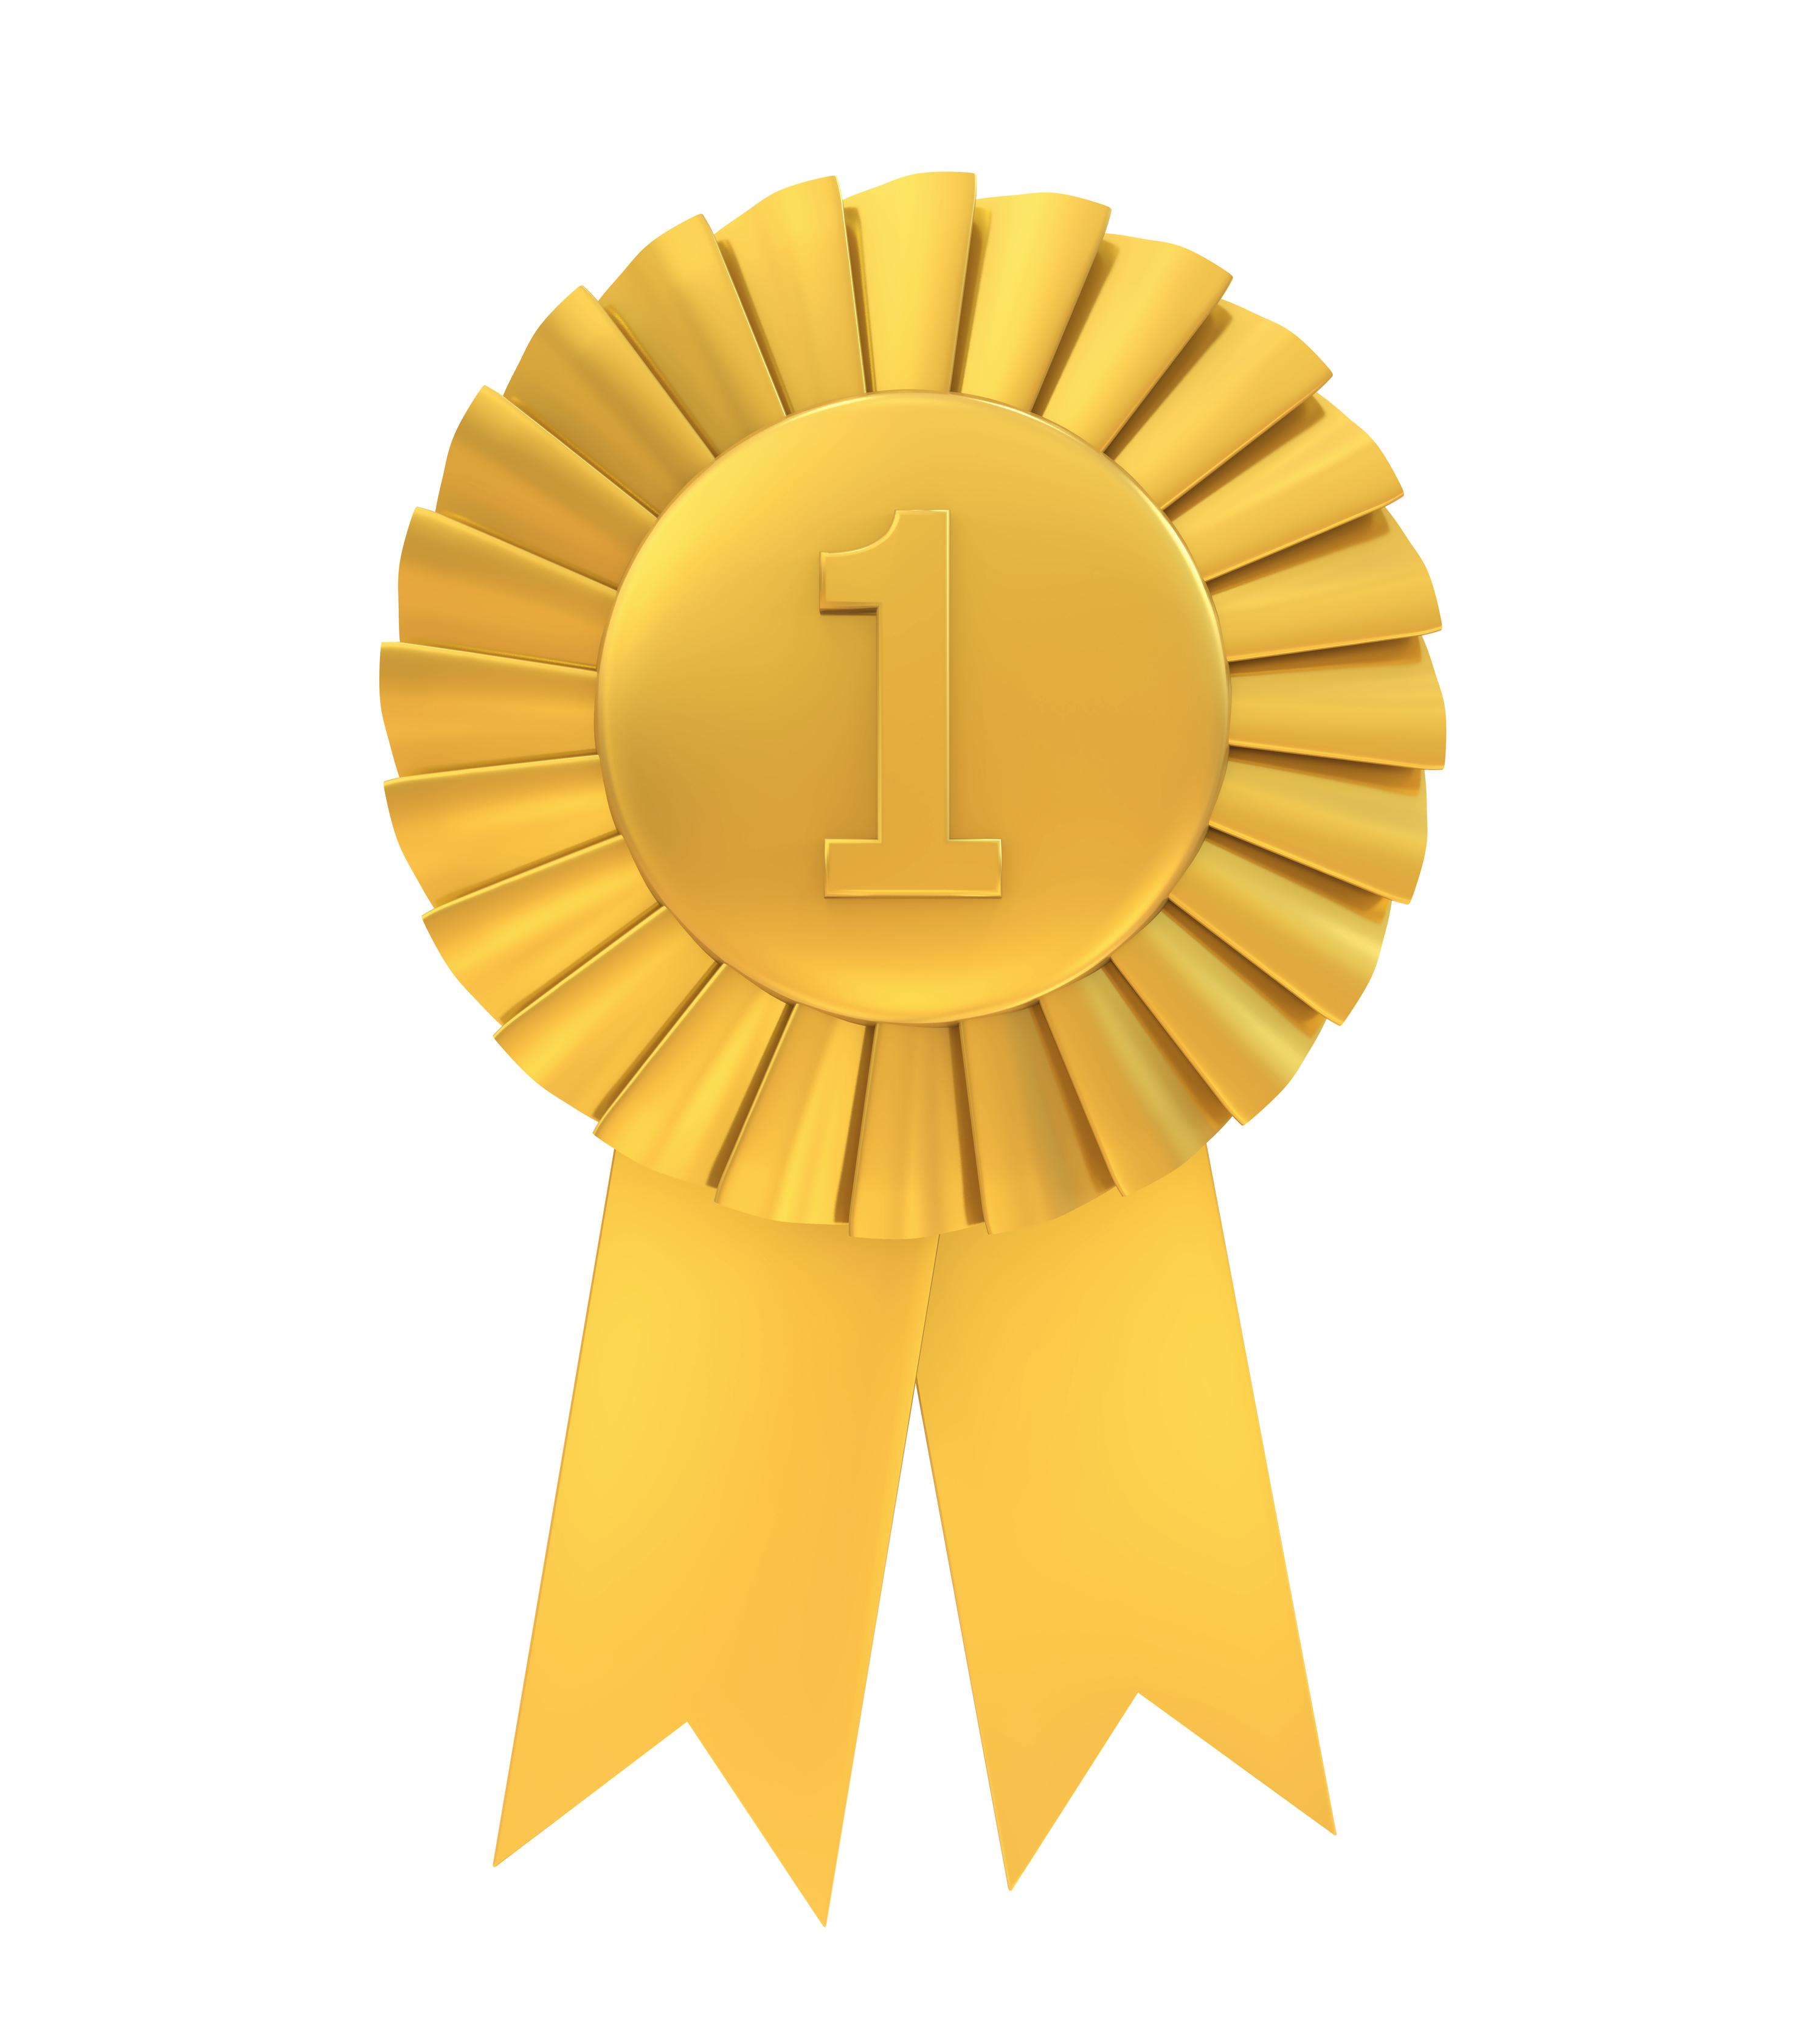 REPORT OKLAHOMA NEAR TOP OF LEADERBOARD IN PRE-K ACCESS